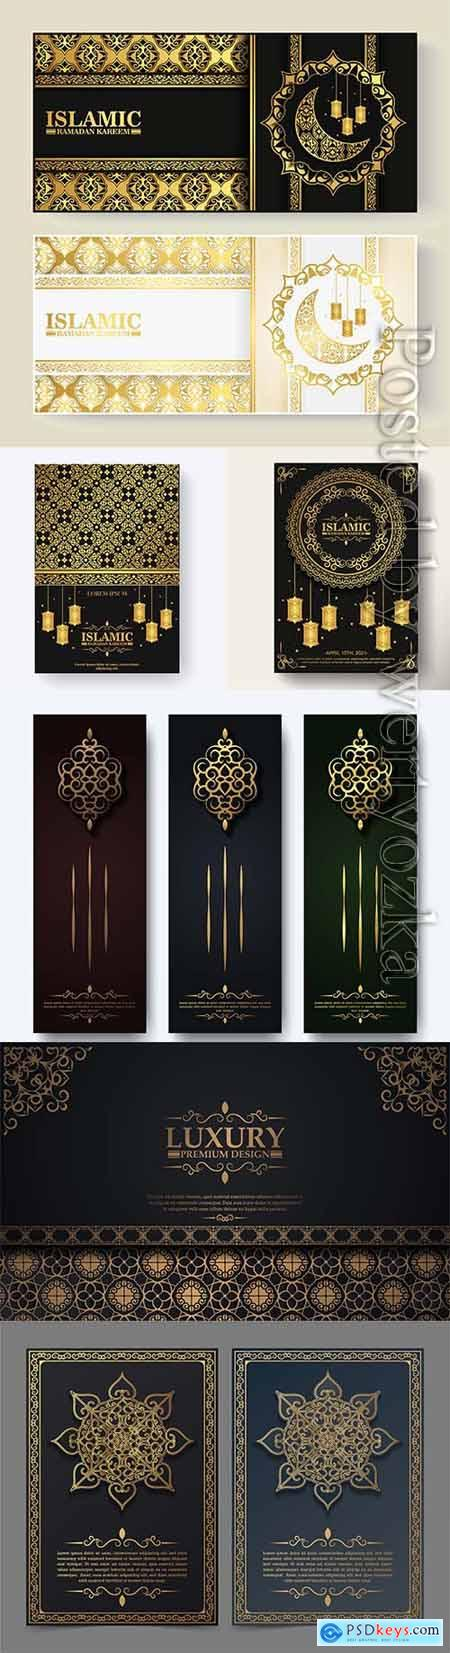 Luxury islamic ramadan kareem vector greeting card